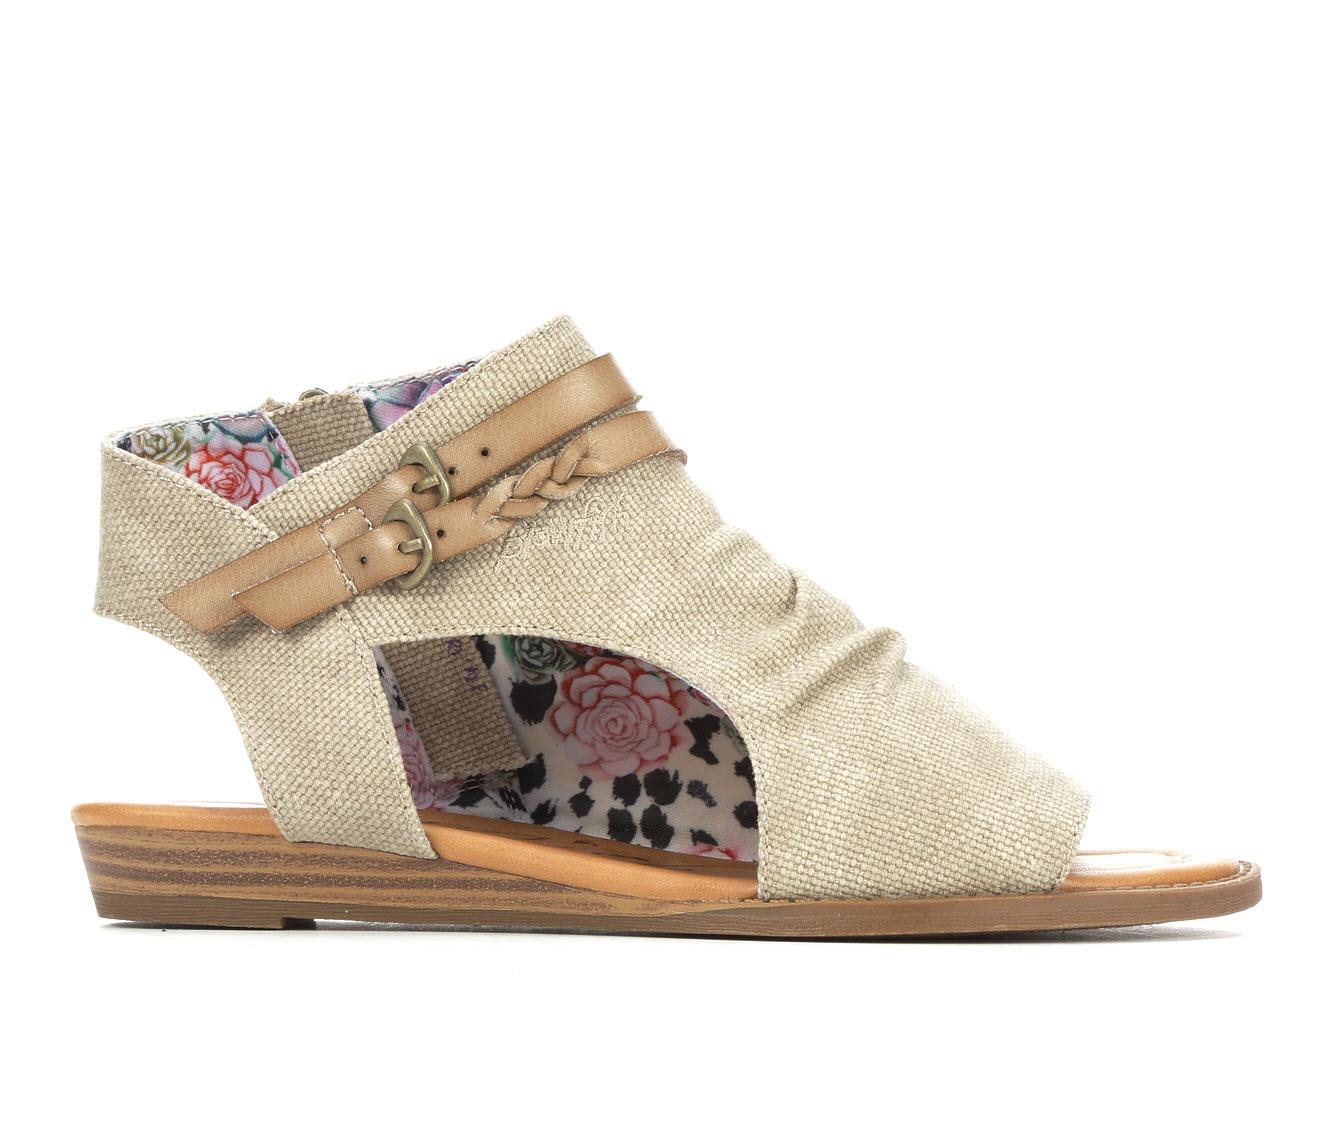 Blowfish Malibu Blumoon Women's Sandal (Beige Canvas)